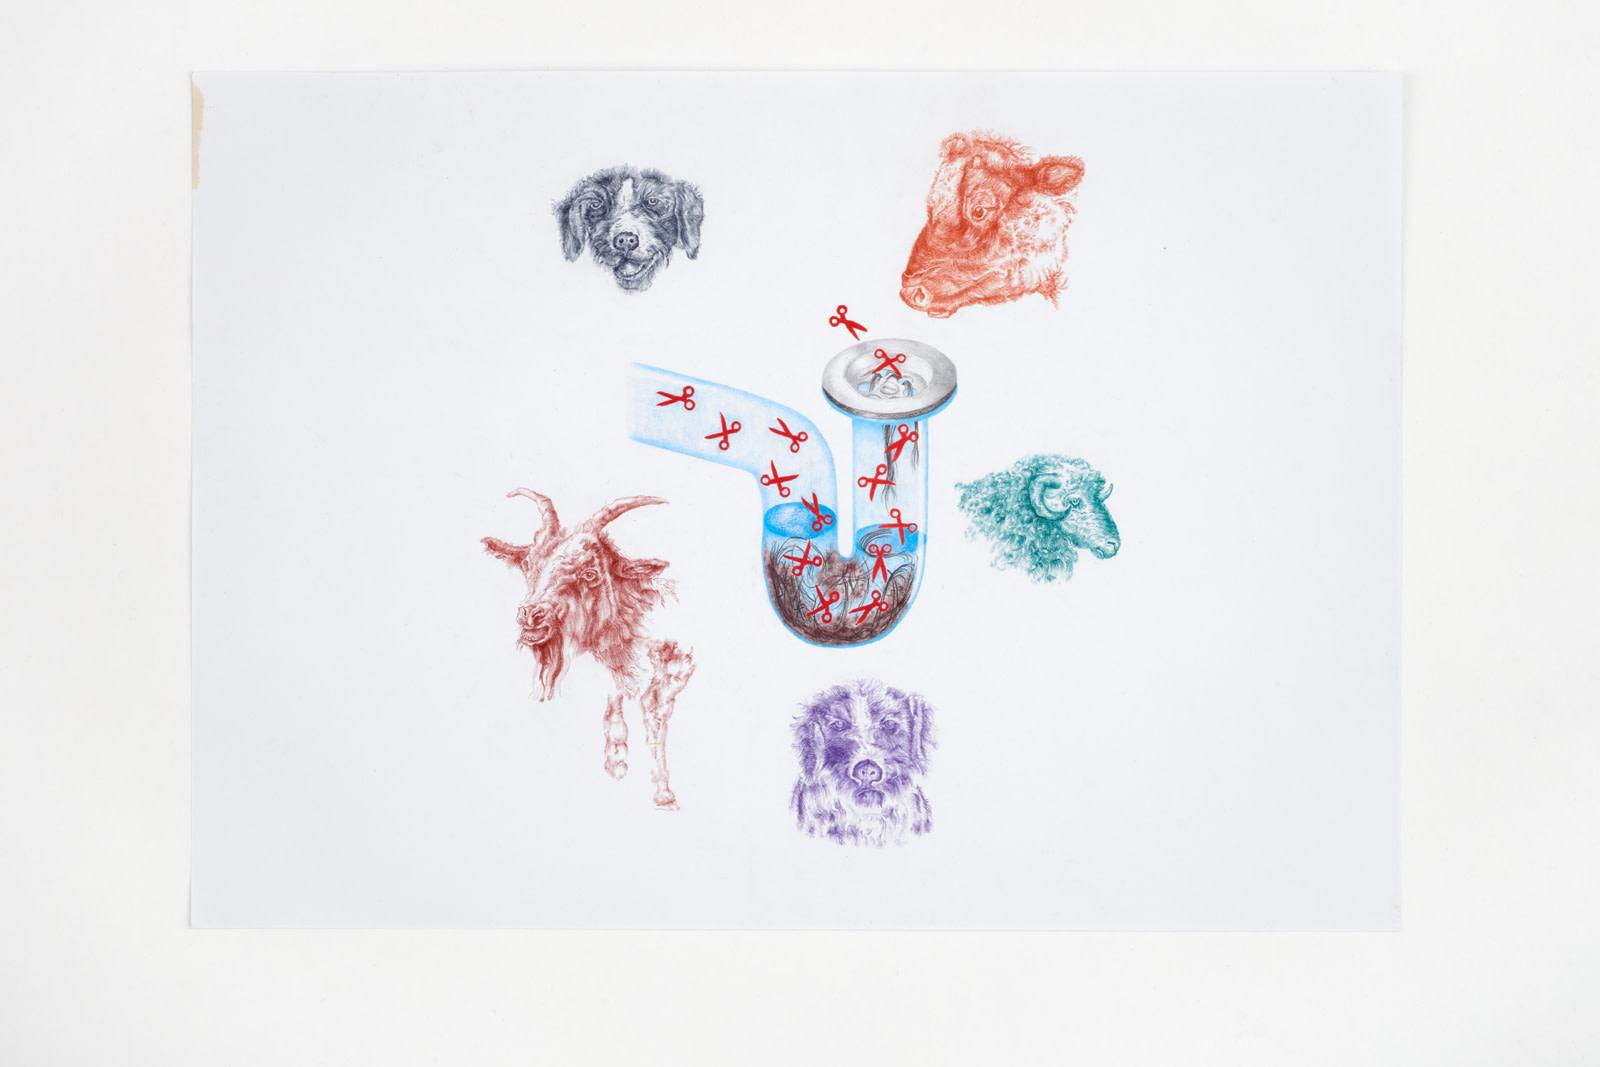 "<div class=""artwork_caption""><div class=""title""><em>Untitled</em>, 2020</div><div class=""medium"">coloured pencil on paper</div><div class=""dimensions"">site size: 30.4 x 45.4 cm / 12 x 17 ⅞ in<br />frame size: 34.1 x 46.4 x 2.5 cm / 13 ⅜ x 18 ¼ x 1 in</div></div><div class=""link""><span class=""website_contact_form"" data-contact-form-details=""Untitled , 2020  coloured pencil on paper  site size: 30.4 x 45.4 cm / 12 x 17 ⅞ in frame size: 34.1 x 46.4 x 2.5 cm / 13 ⅜ x 18 ¼ x 1 in"" data-contact-form-image=""https://artlogic-res.cloudinary.com/w_200,h_200,c_fill,f_auto,fl_lossy/ws-sadiecoles/usr/exhibitions/images/exhibitions/829/hq24-hm16789d-untitled_unframed.jpeg"">Enquire</span></div>"